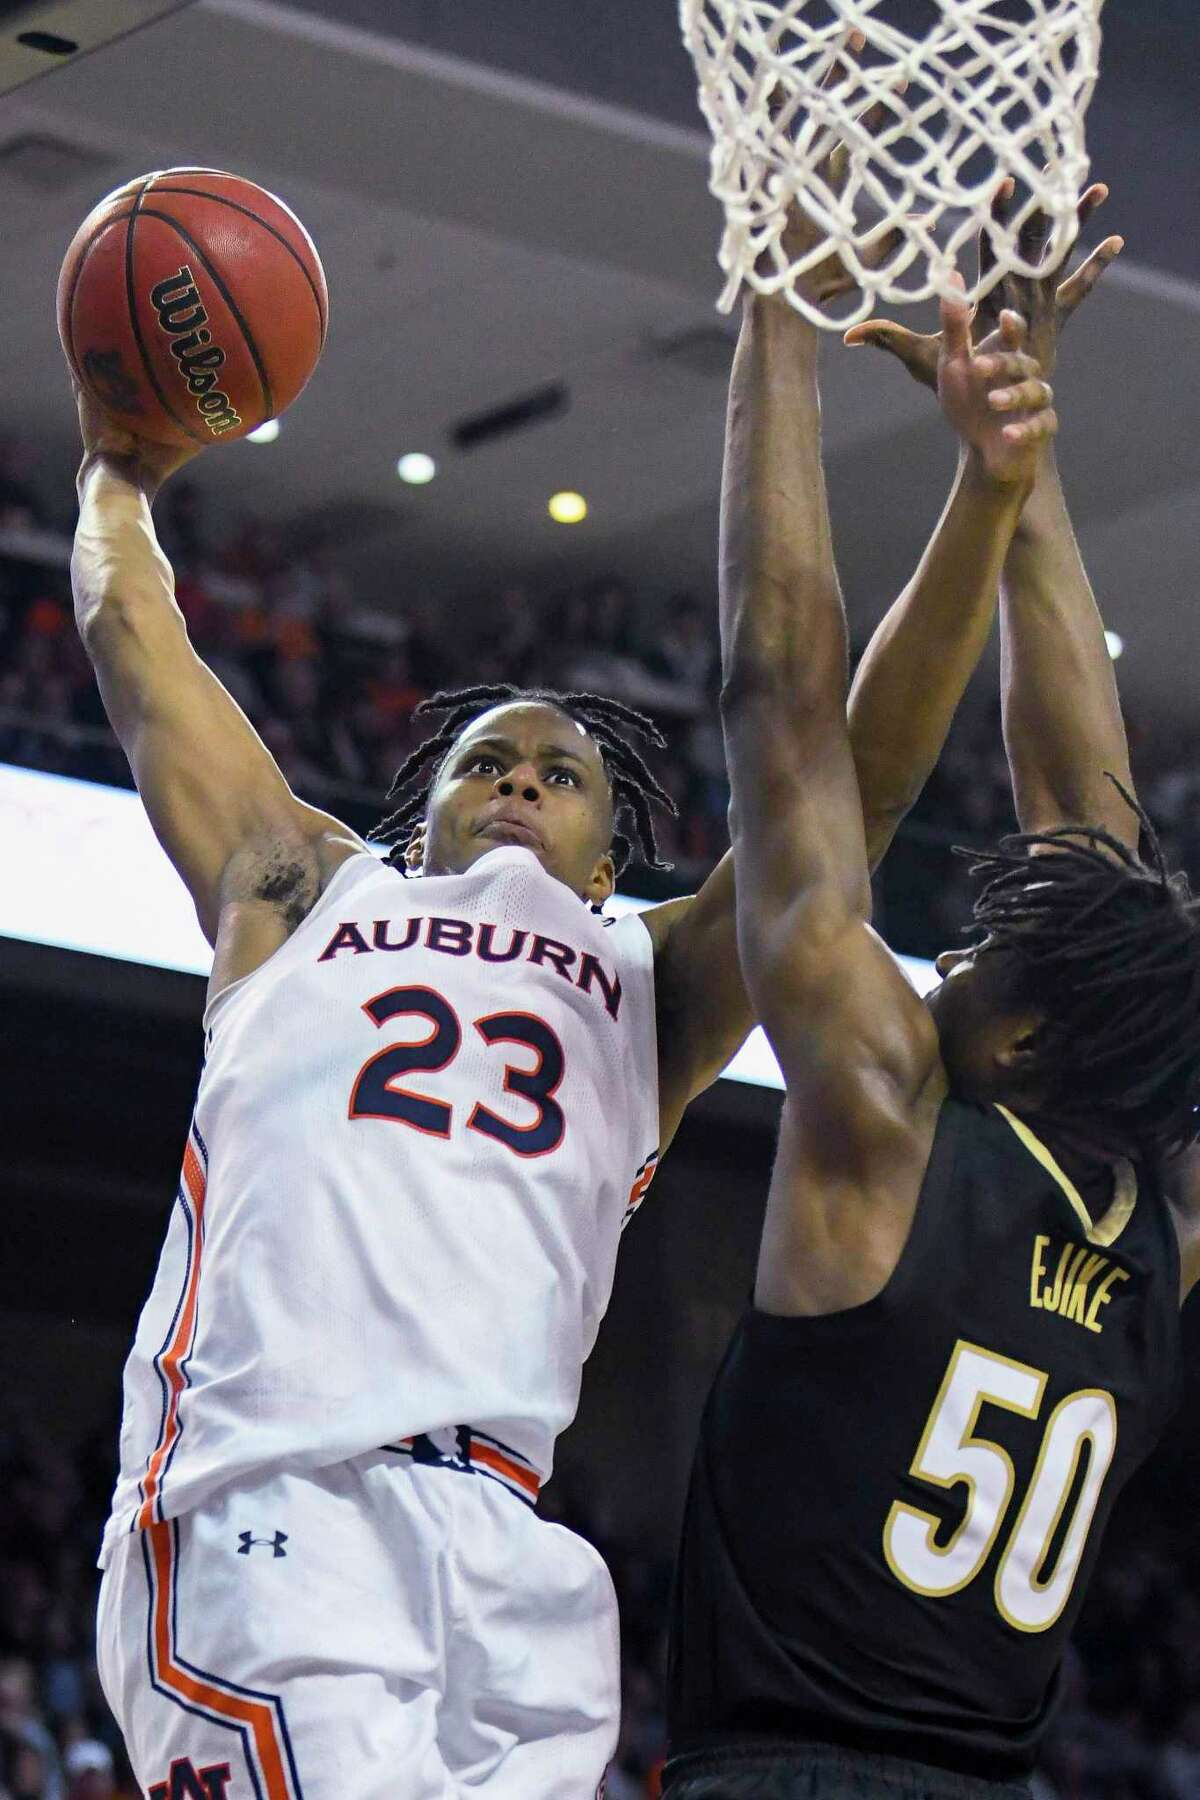 Auburn forward Isaac Okoro (23) dunks and is fouled by Vanderbilt's Ejike Obinna (50) during the second half of an NCAA college basketball game Wednesday, Jan. 8, 2020, in Auburn, Ala. (AP Photo/Julie Bennett)